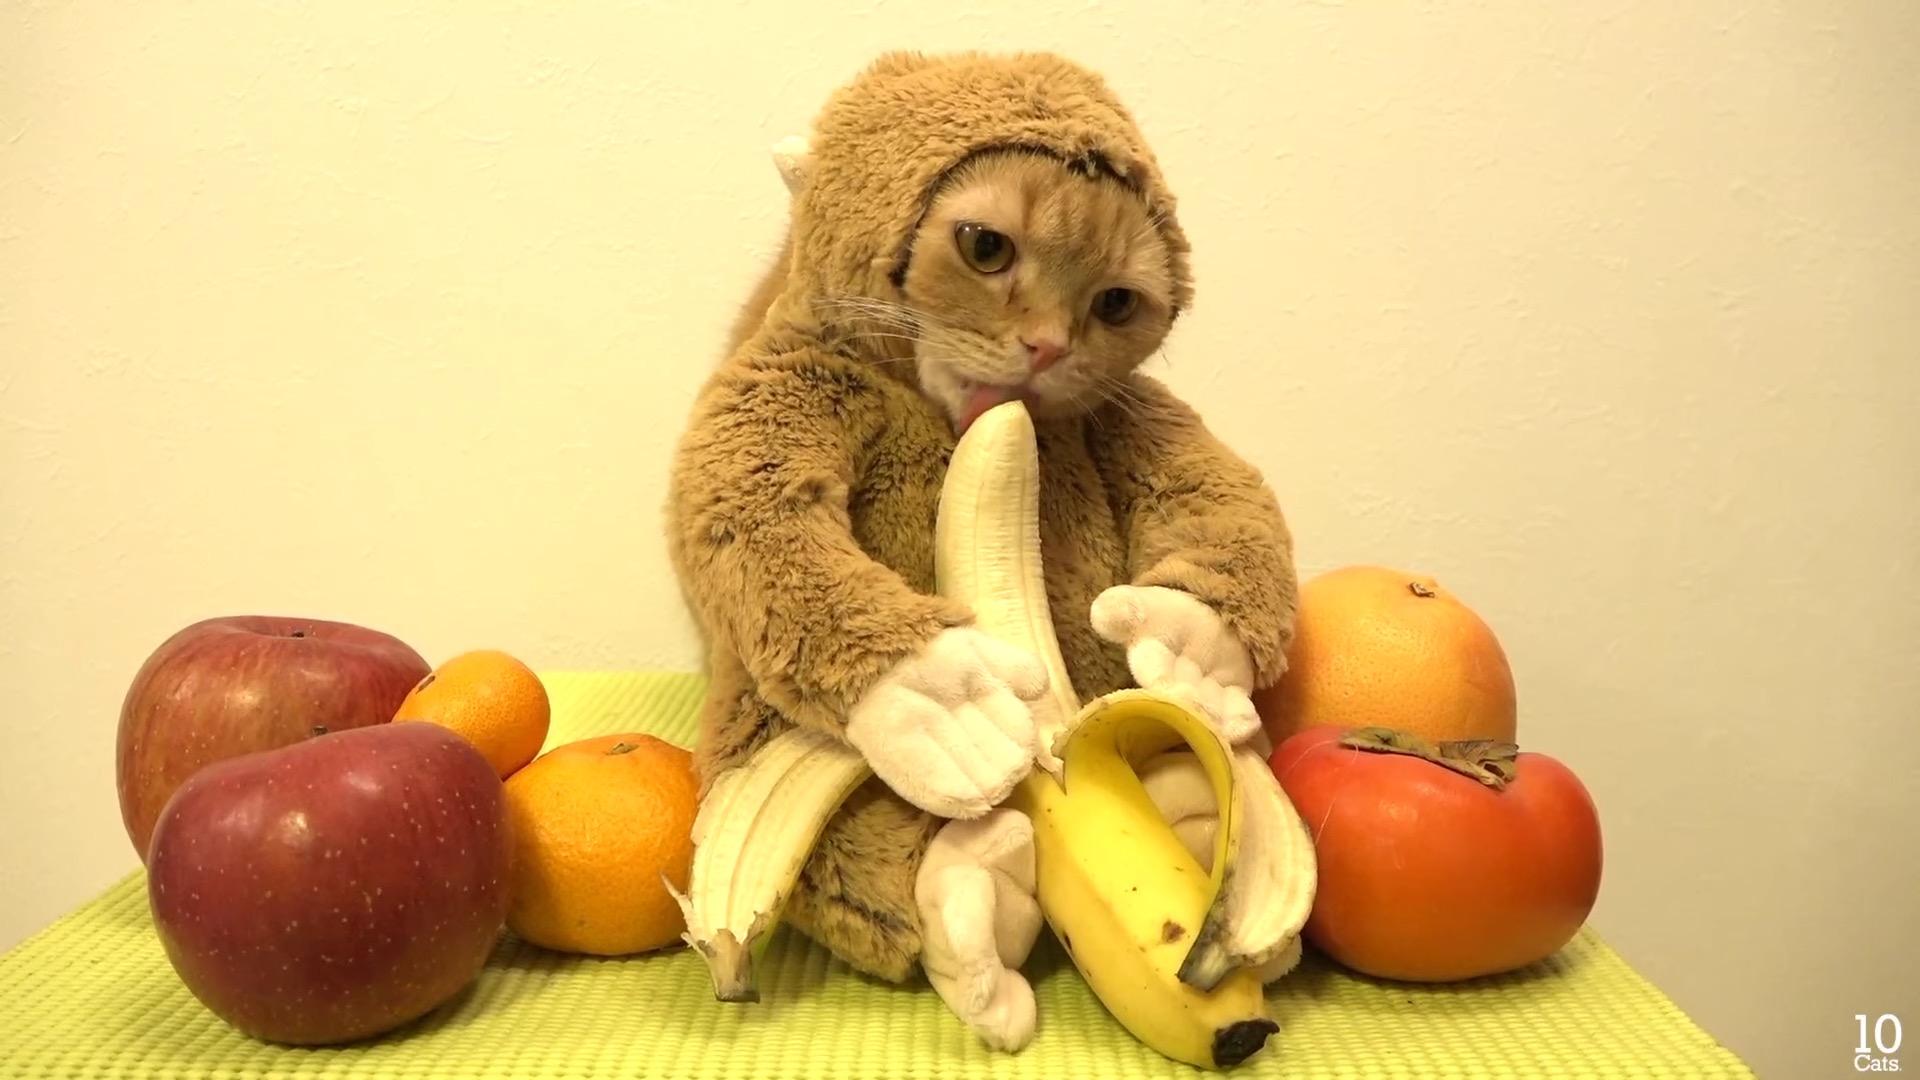 Cat In Monkey Suit, Mini Pig Eats Dog's Food & Puppy Walks